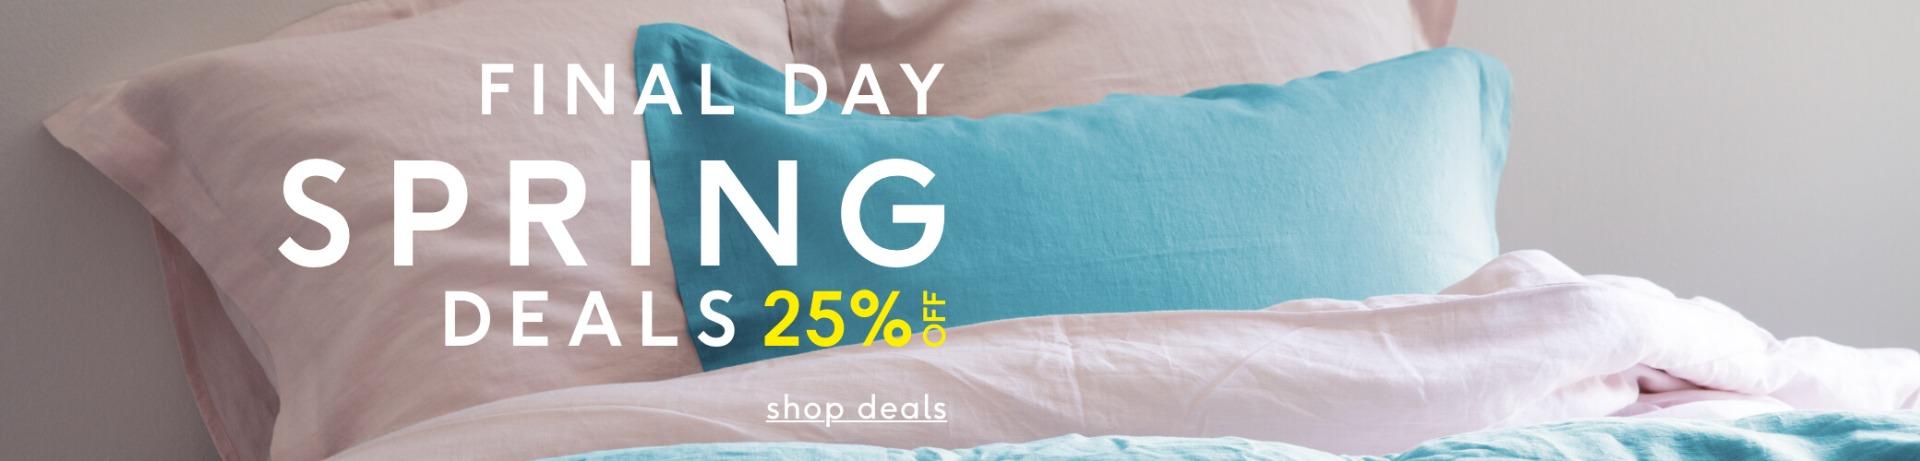 Shop Spring Deals - 25% Off